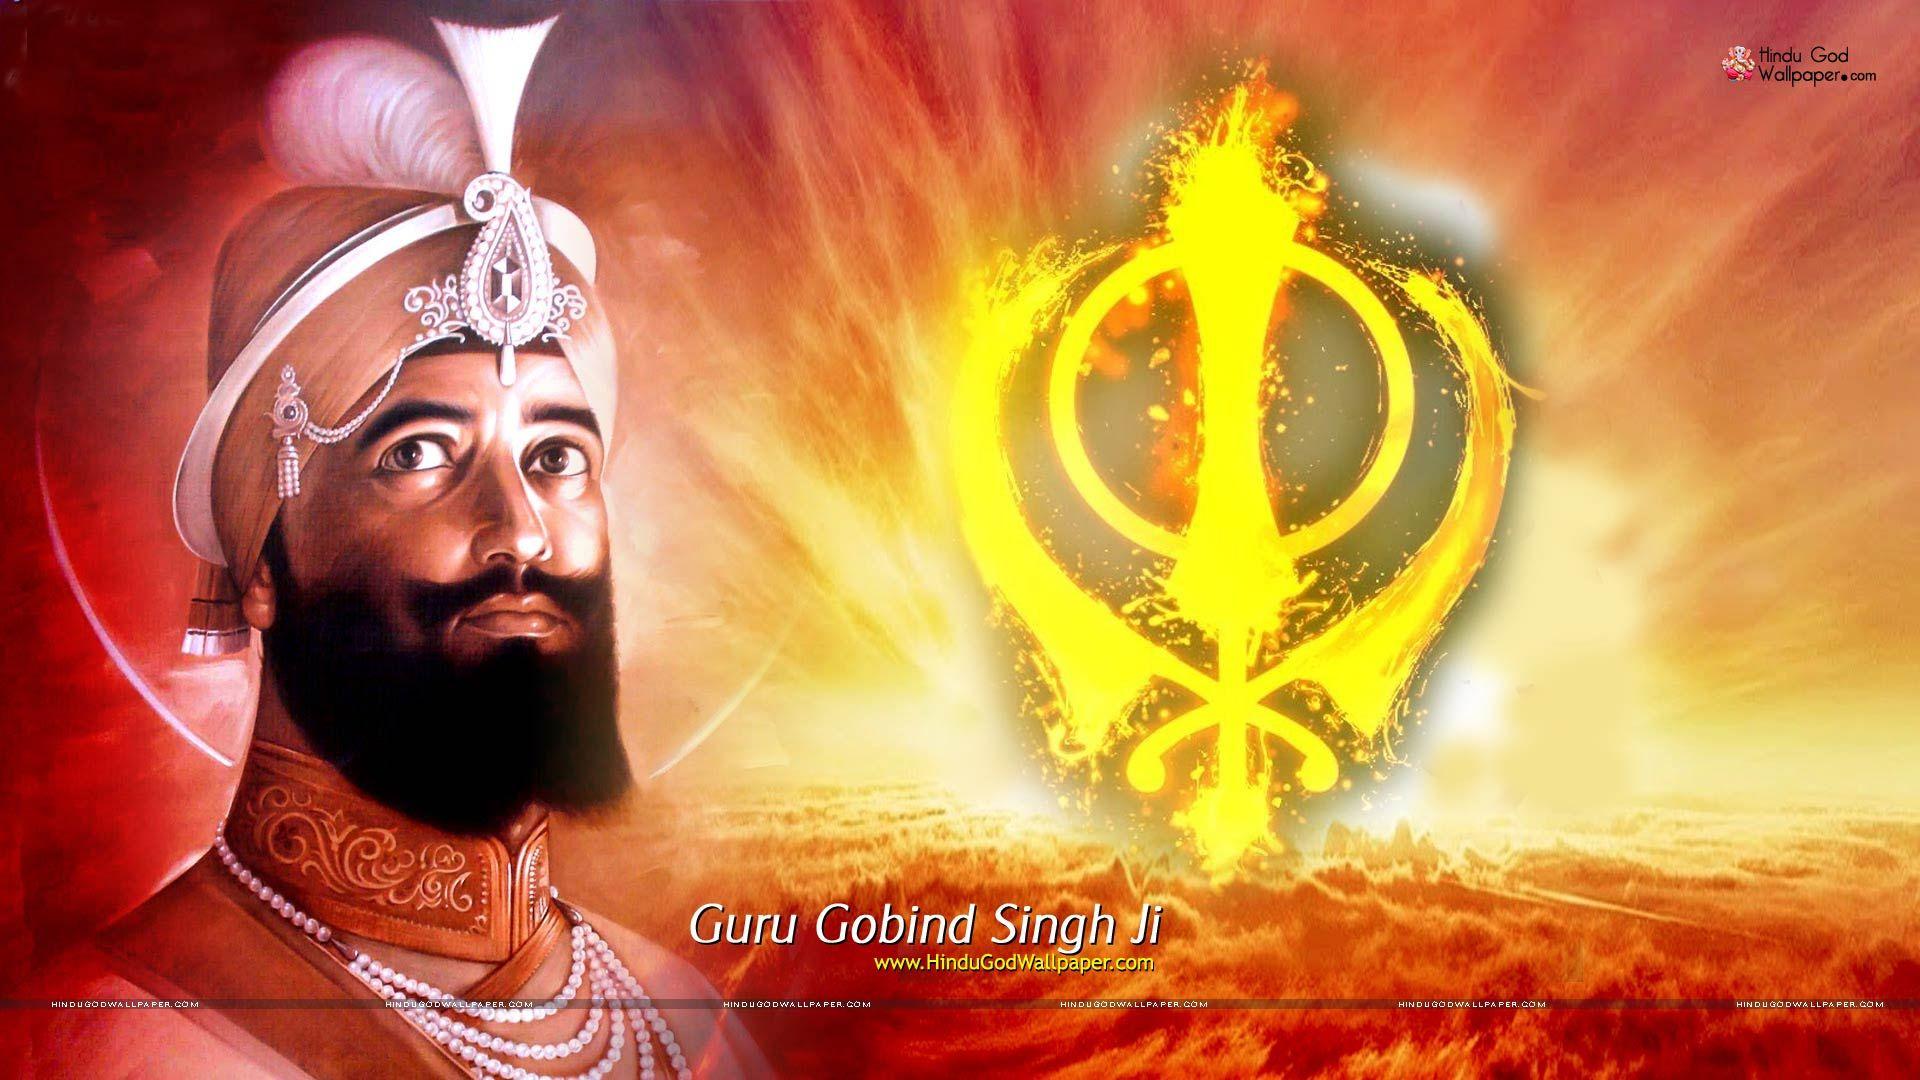 Guru Gobind Singh Ji Hd Wallpapers